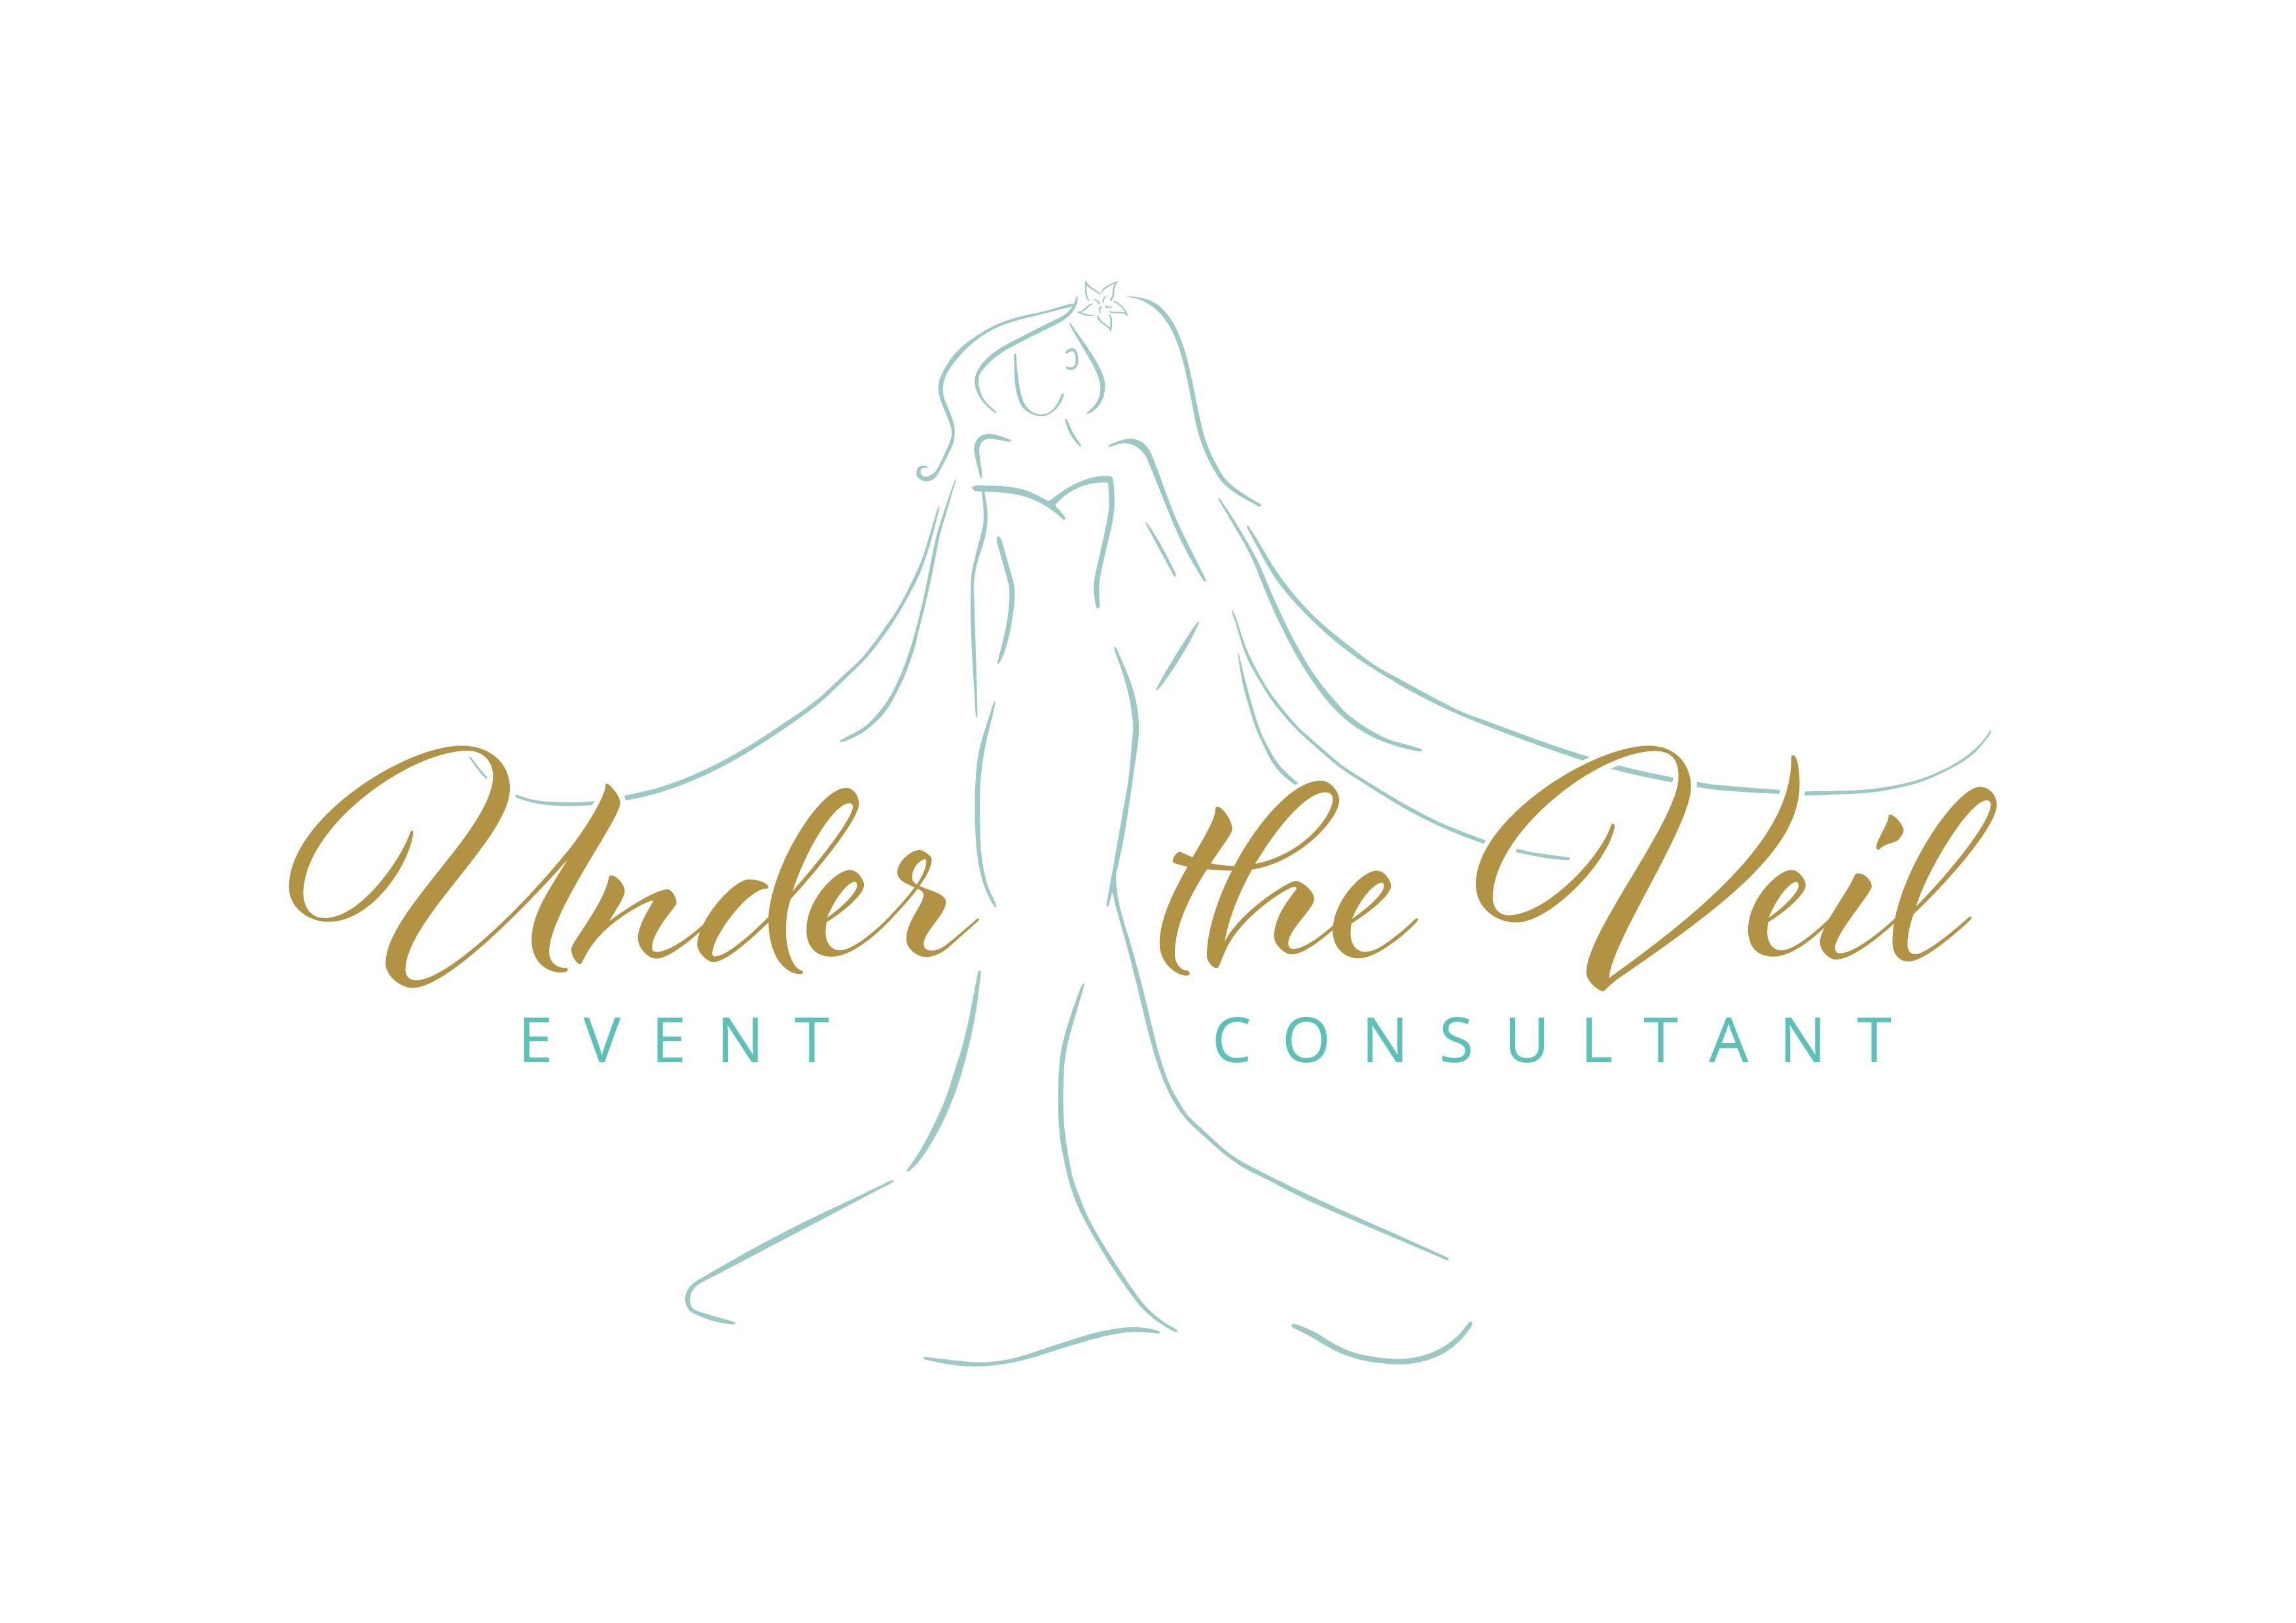 Wedding Planner/Event Consultant Logo